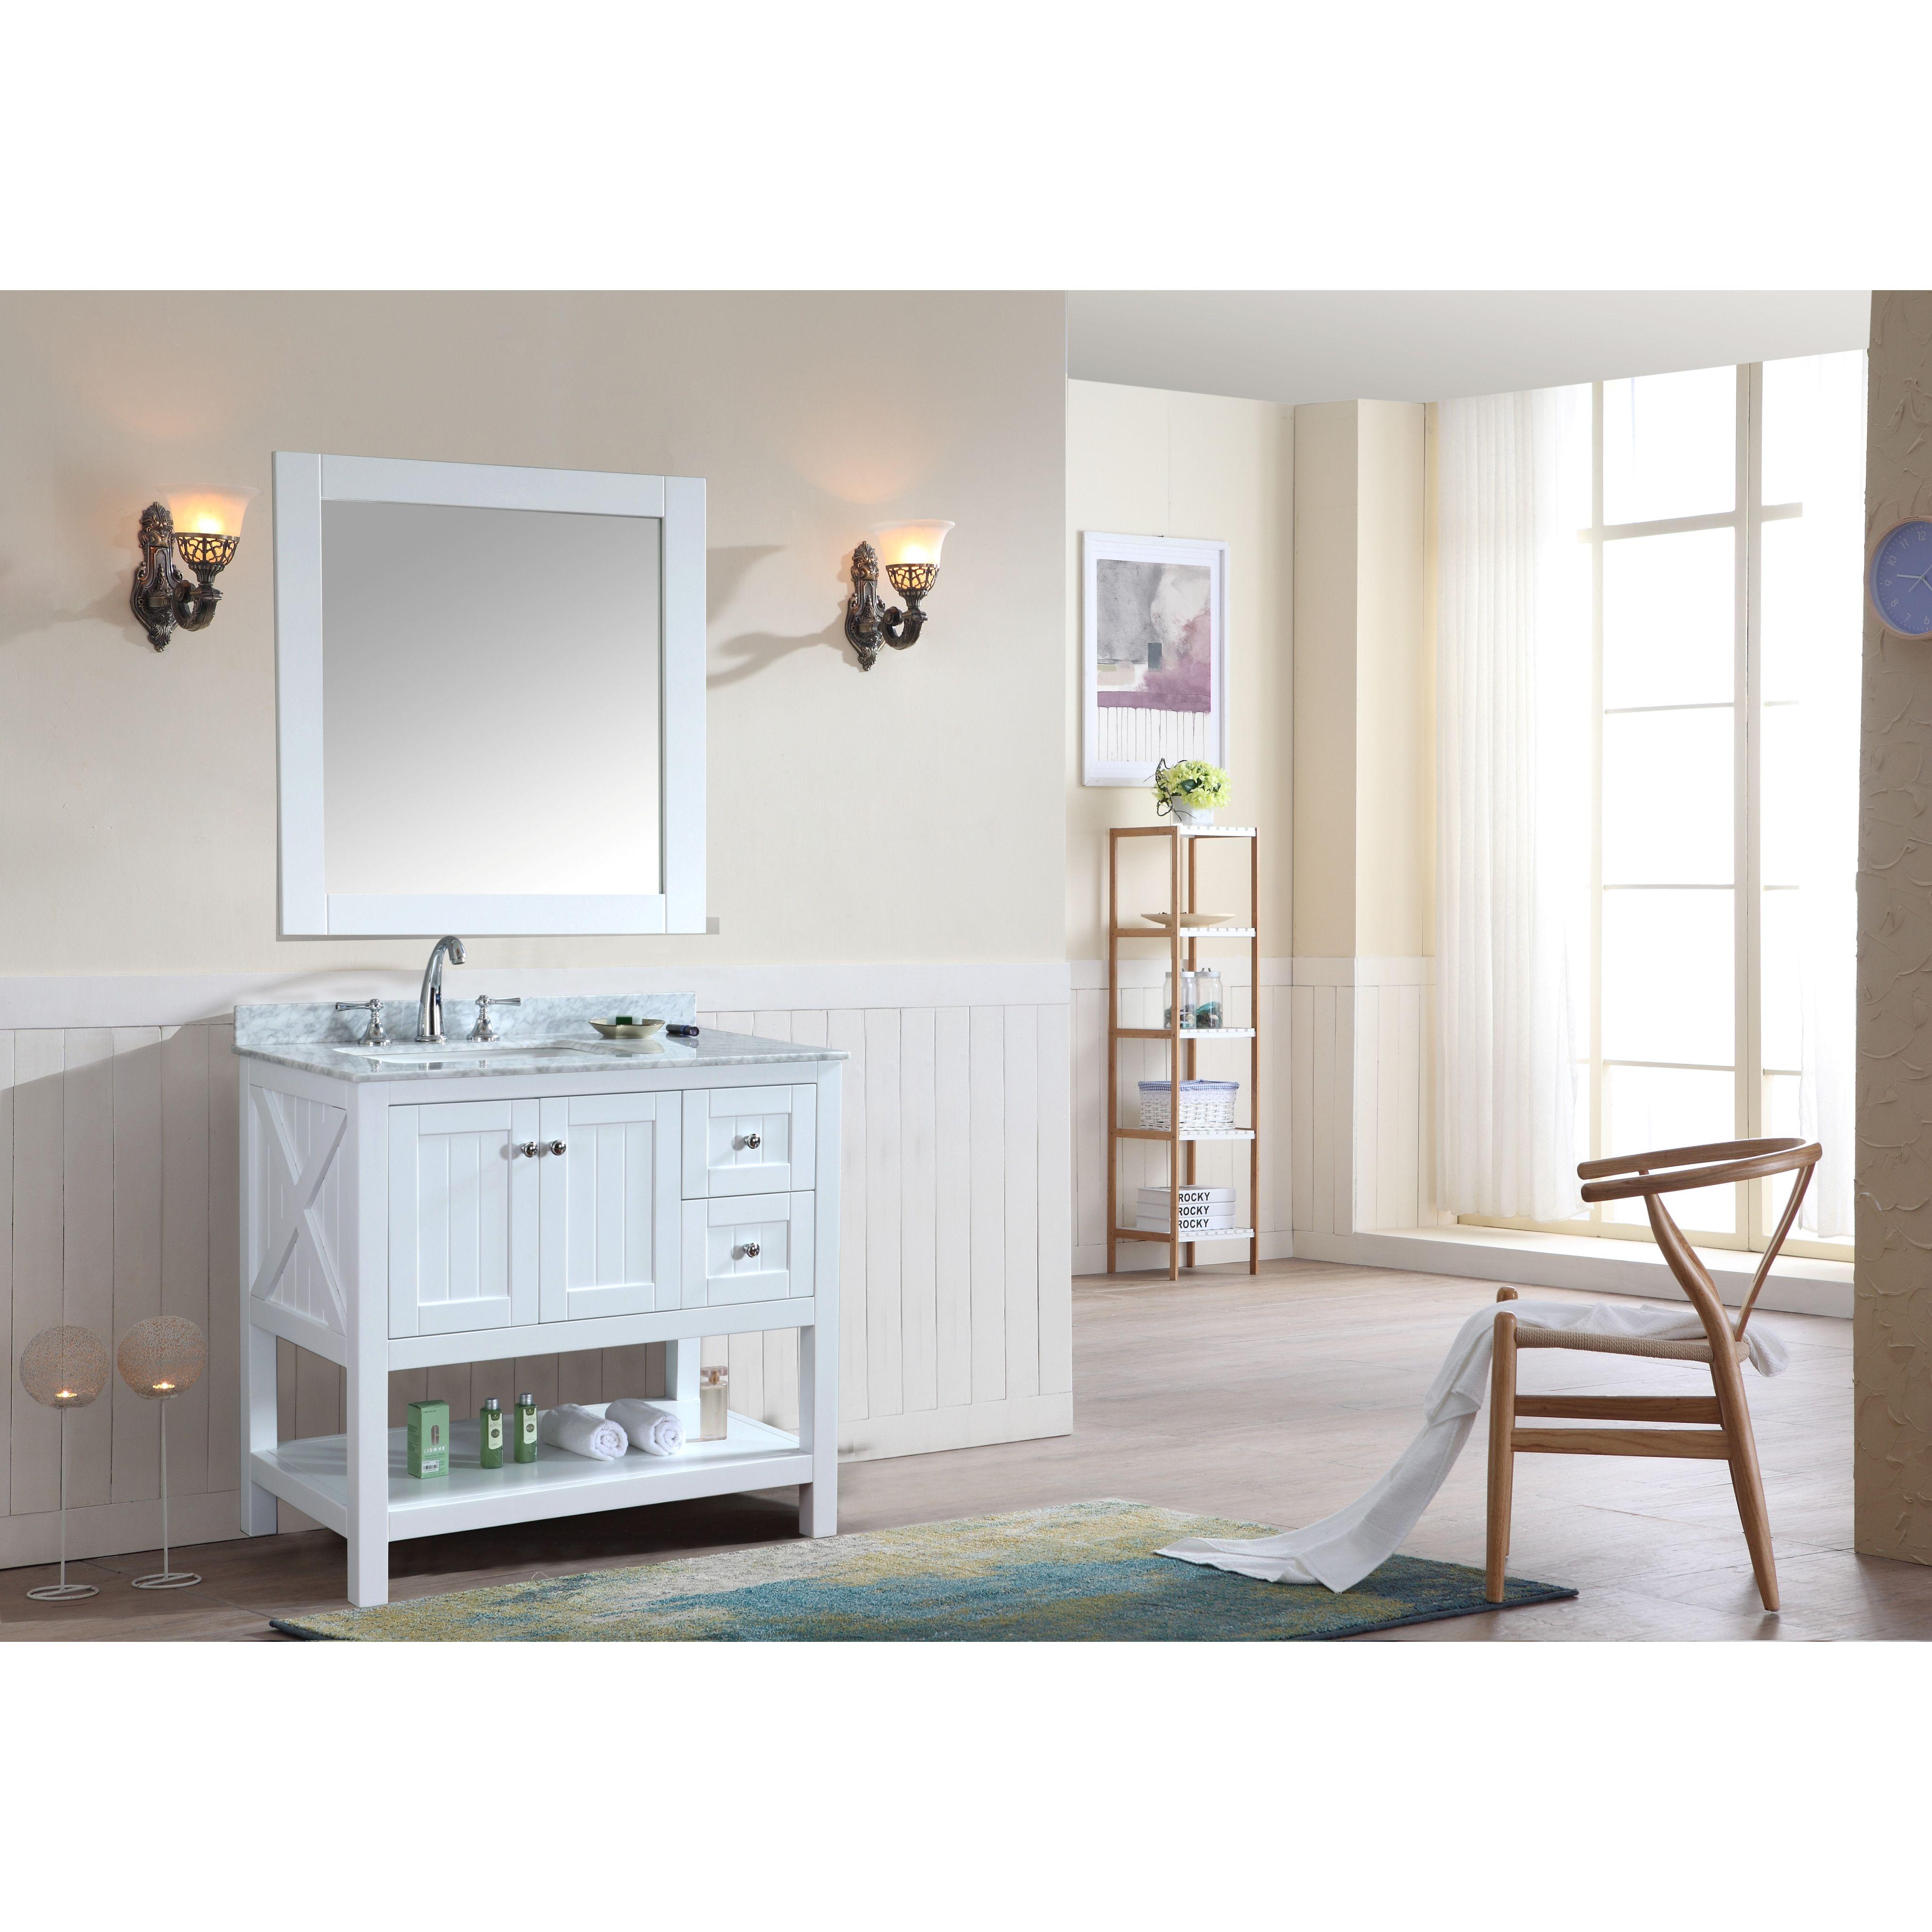 Sets bathroom vanity ari kitchen second - Ari Kitchen Bath Emily 36 Single Bathroom Vanity Set With Mirror